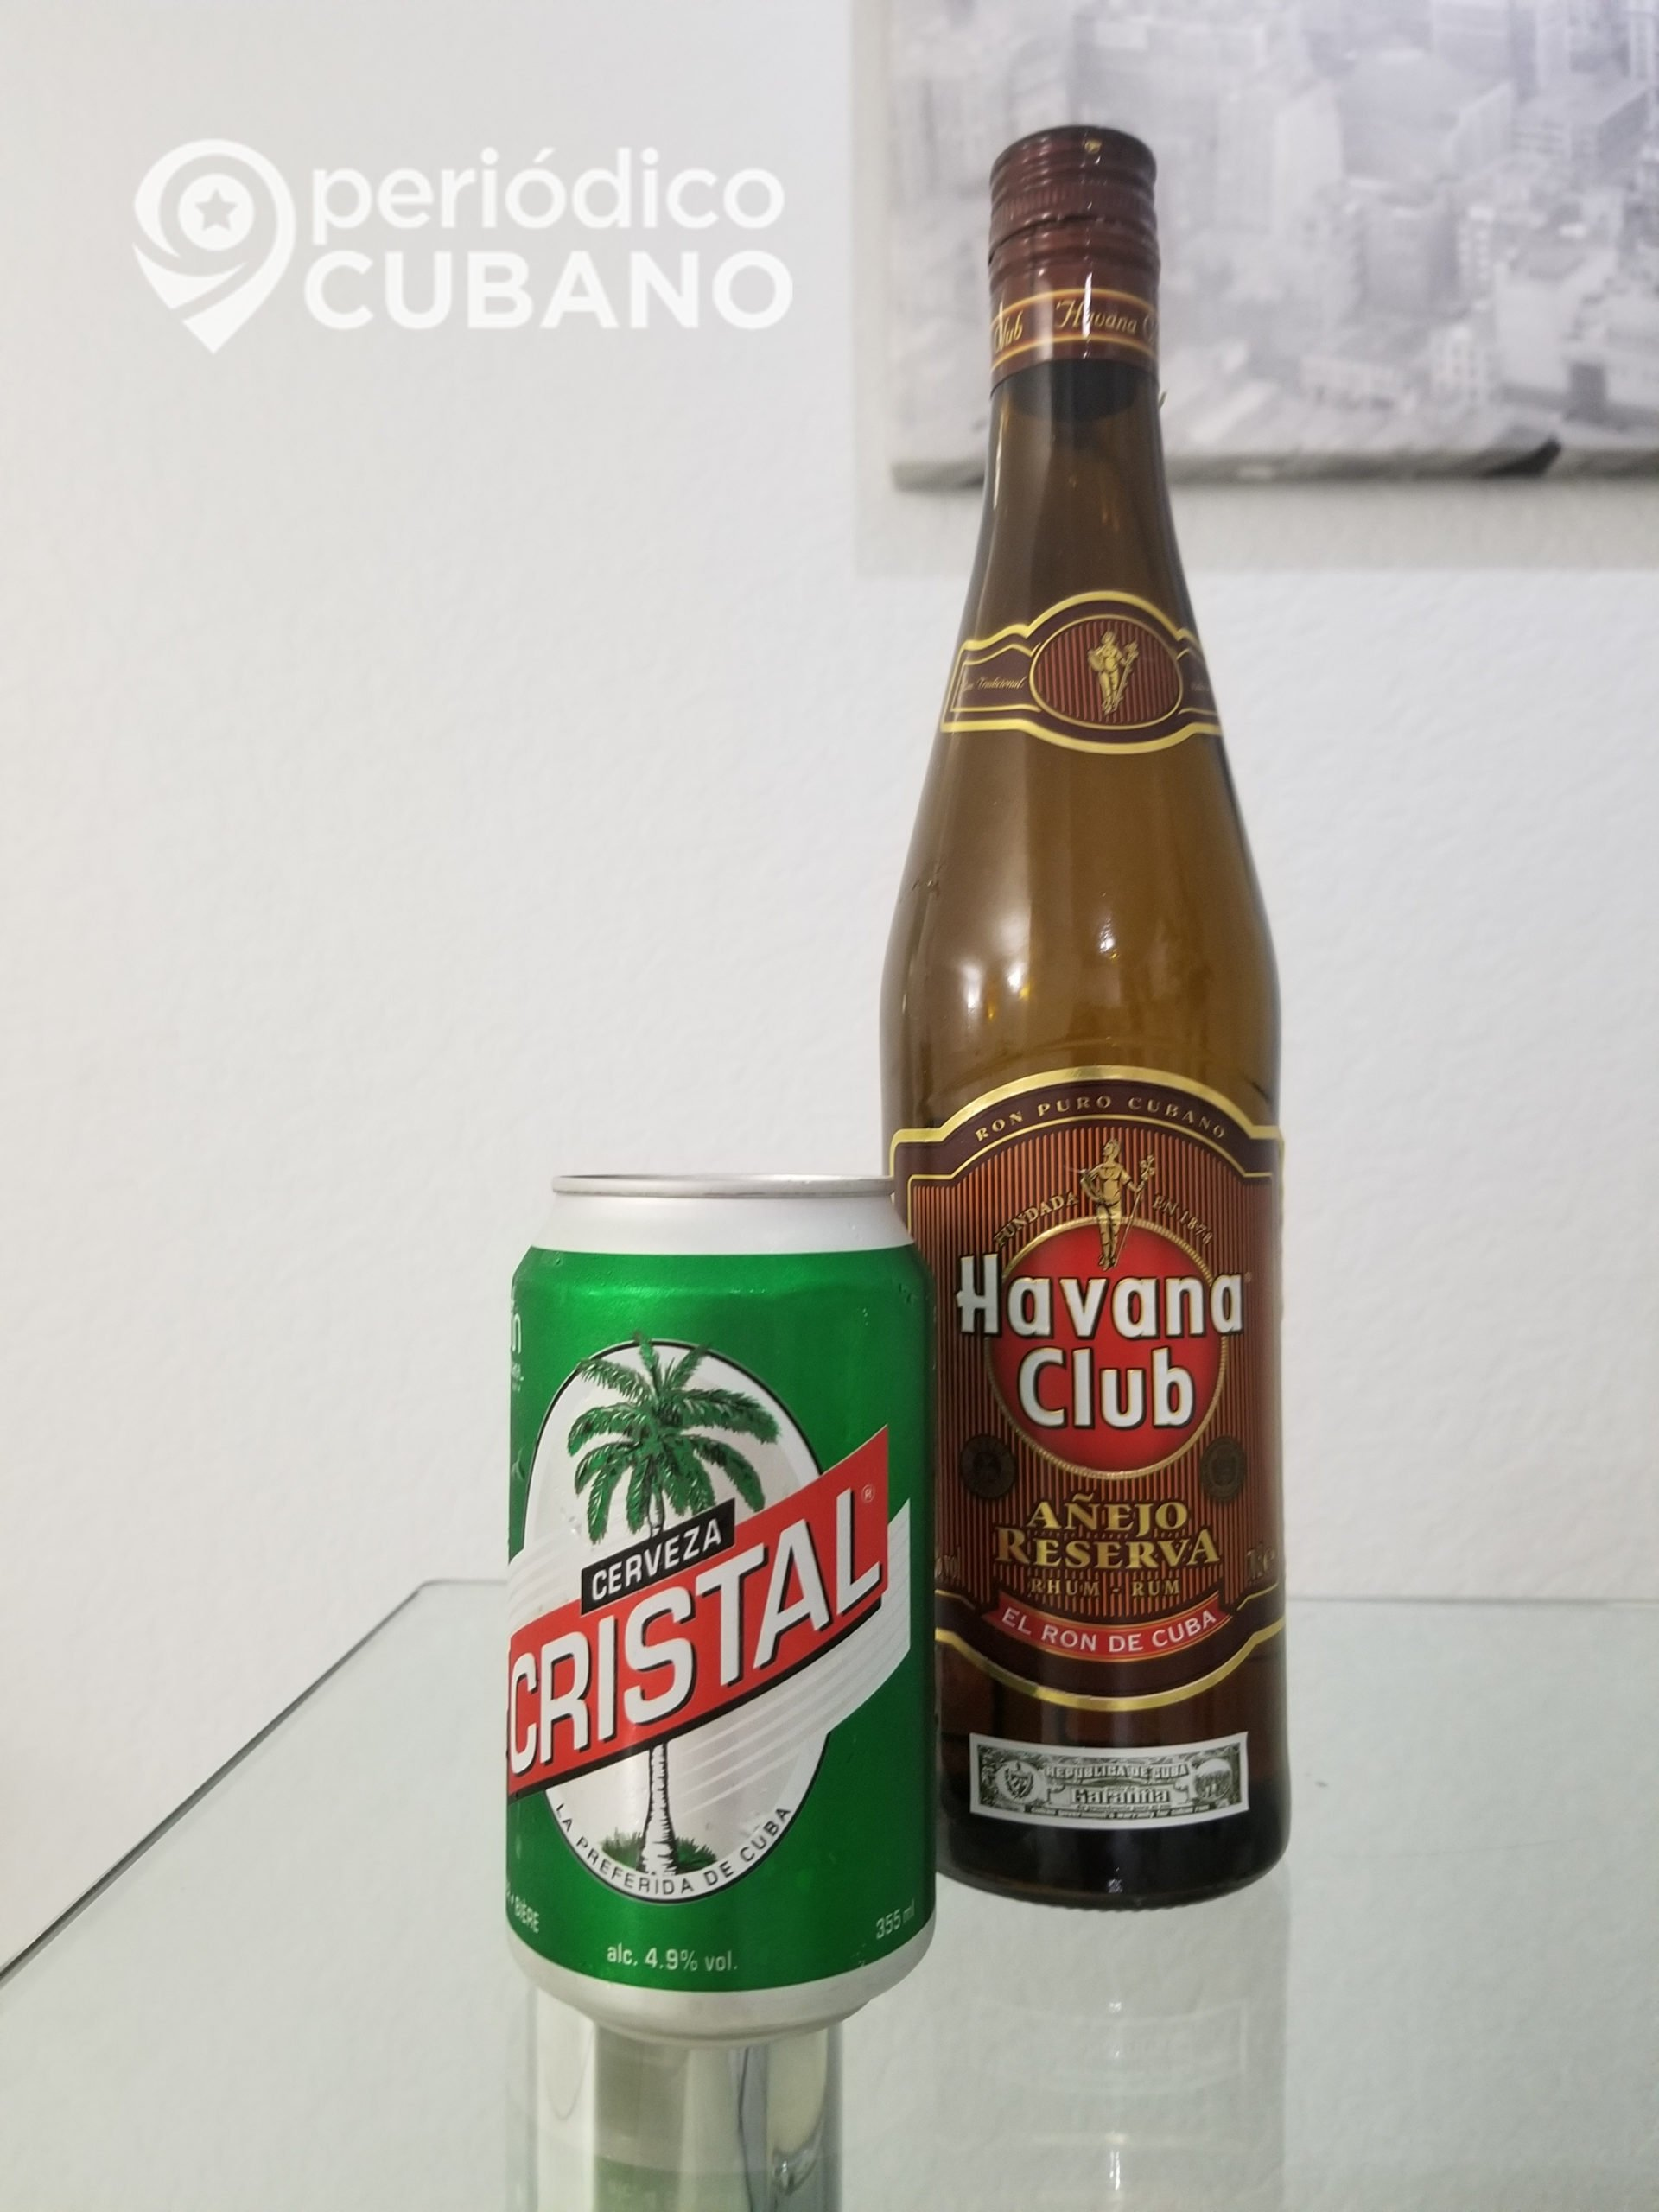 botella de ron y lata de cerveza cristal cubana (12)